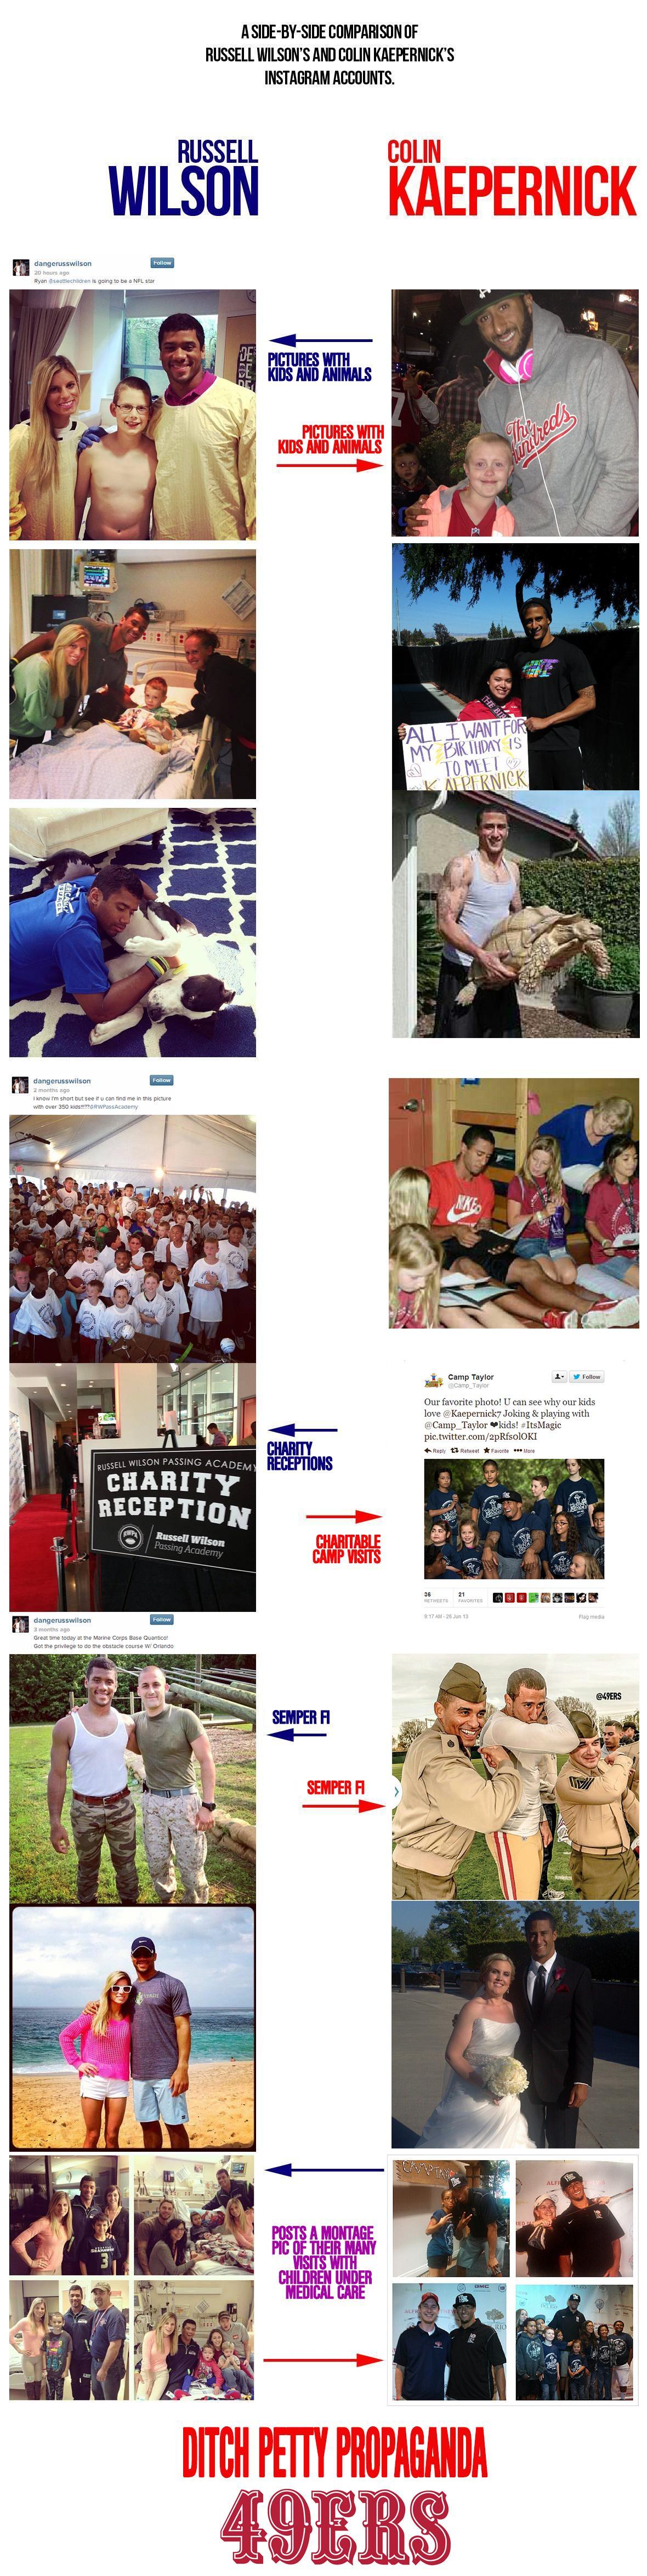 wilson kaepernick instagram accounts compared